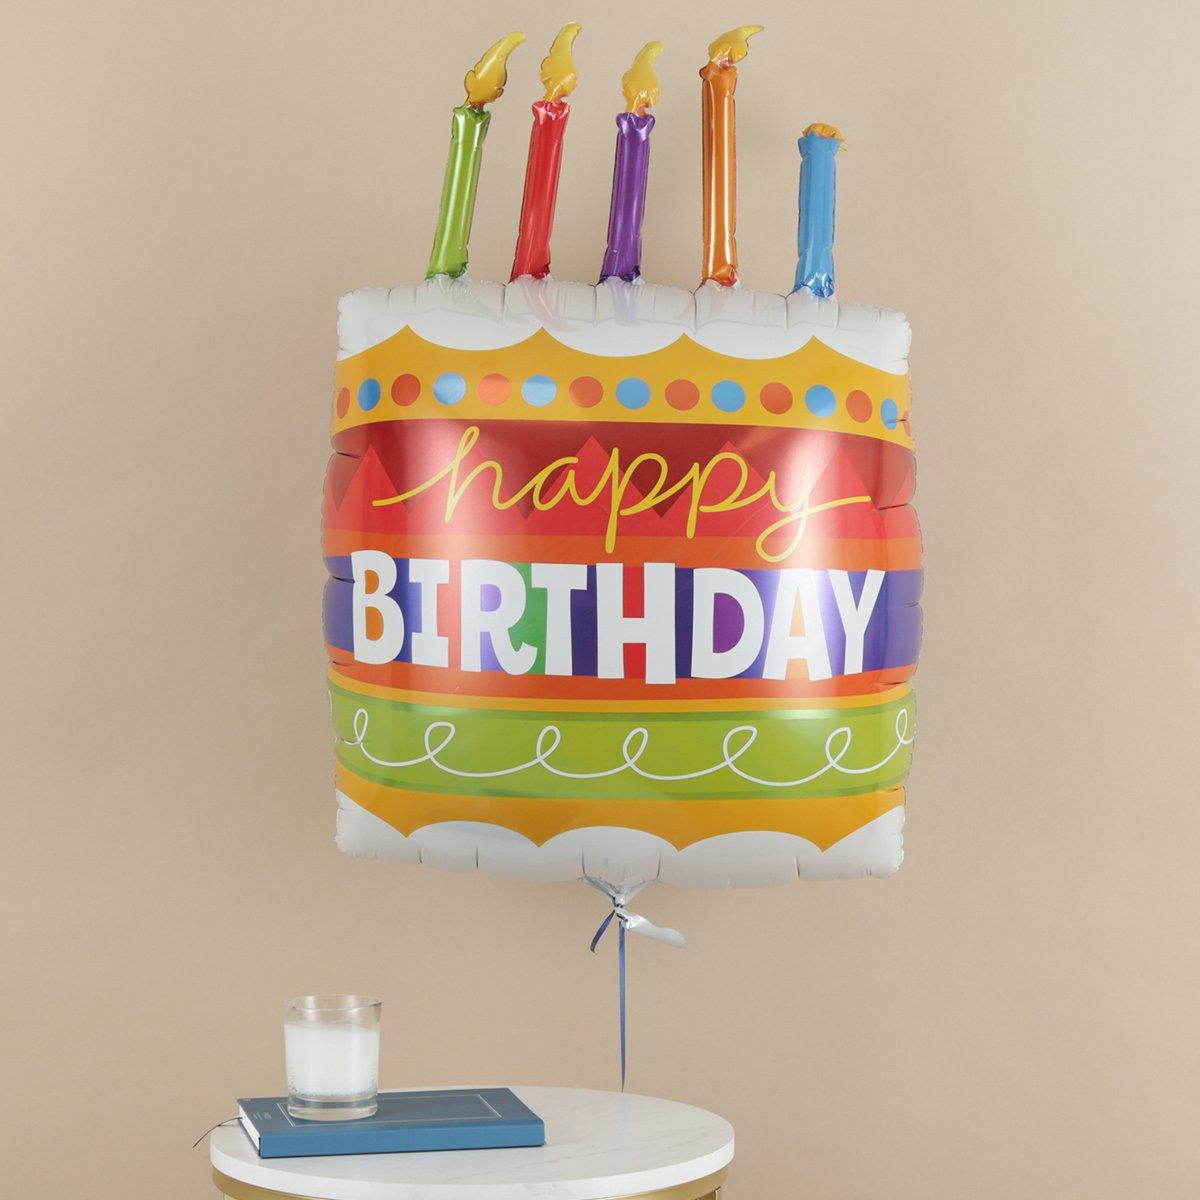 Giant Happy Birthday Cake Balloon Moonpig